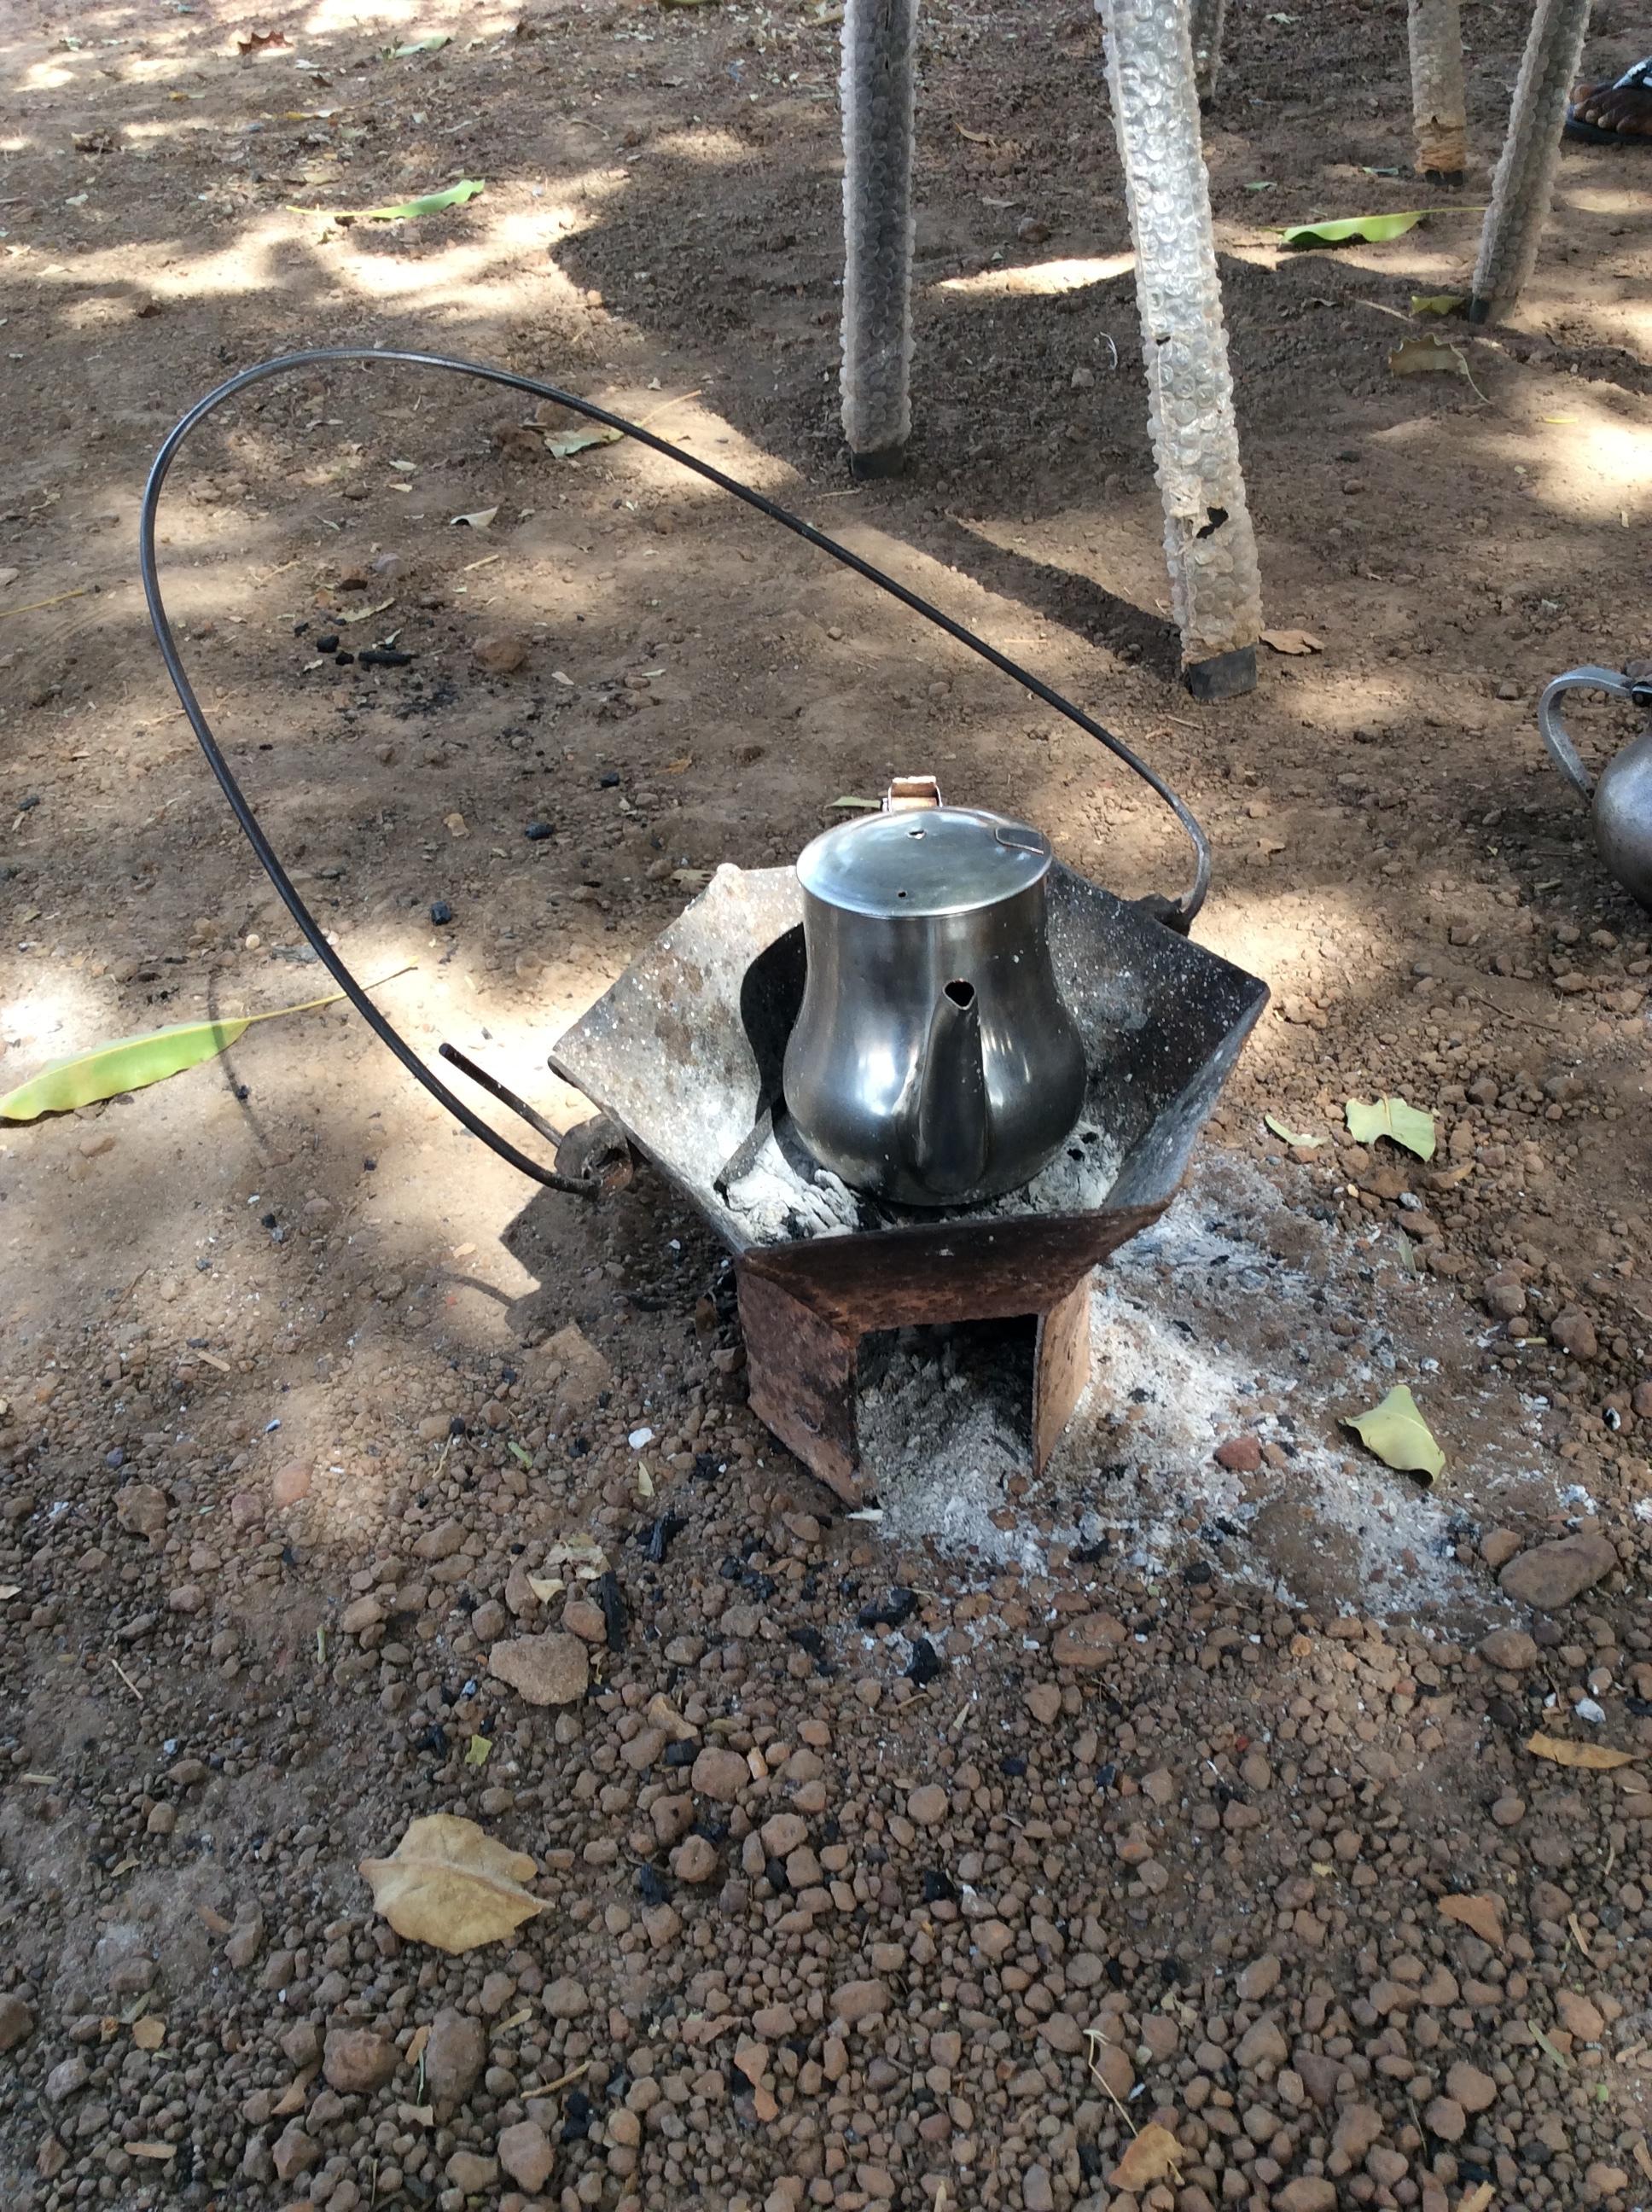 Teachers making tea in the school yard while on a break.